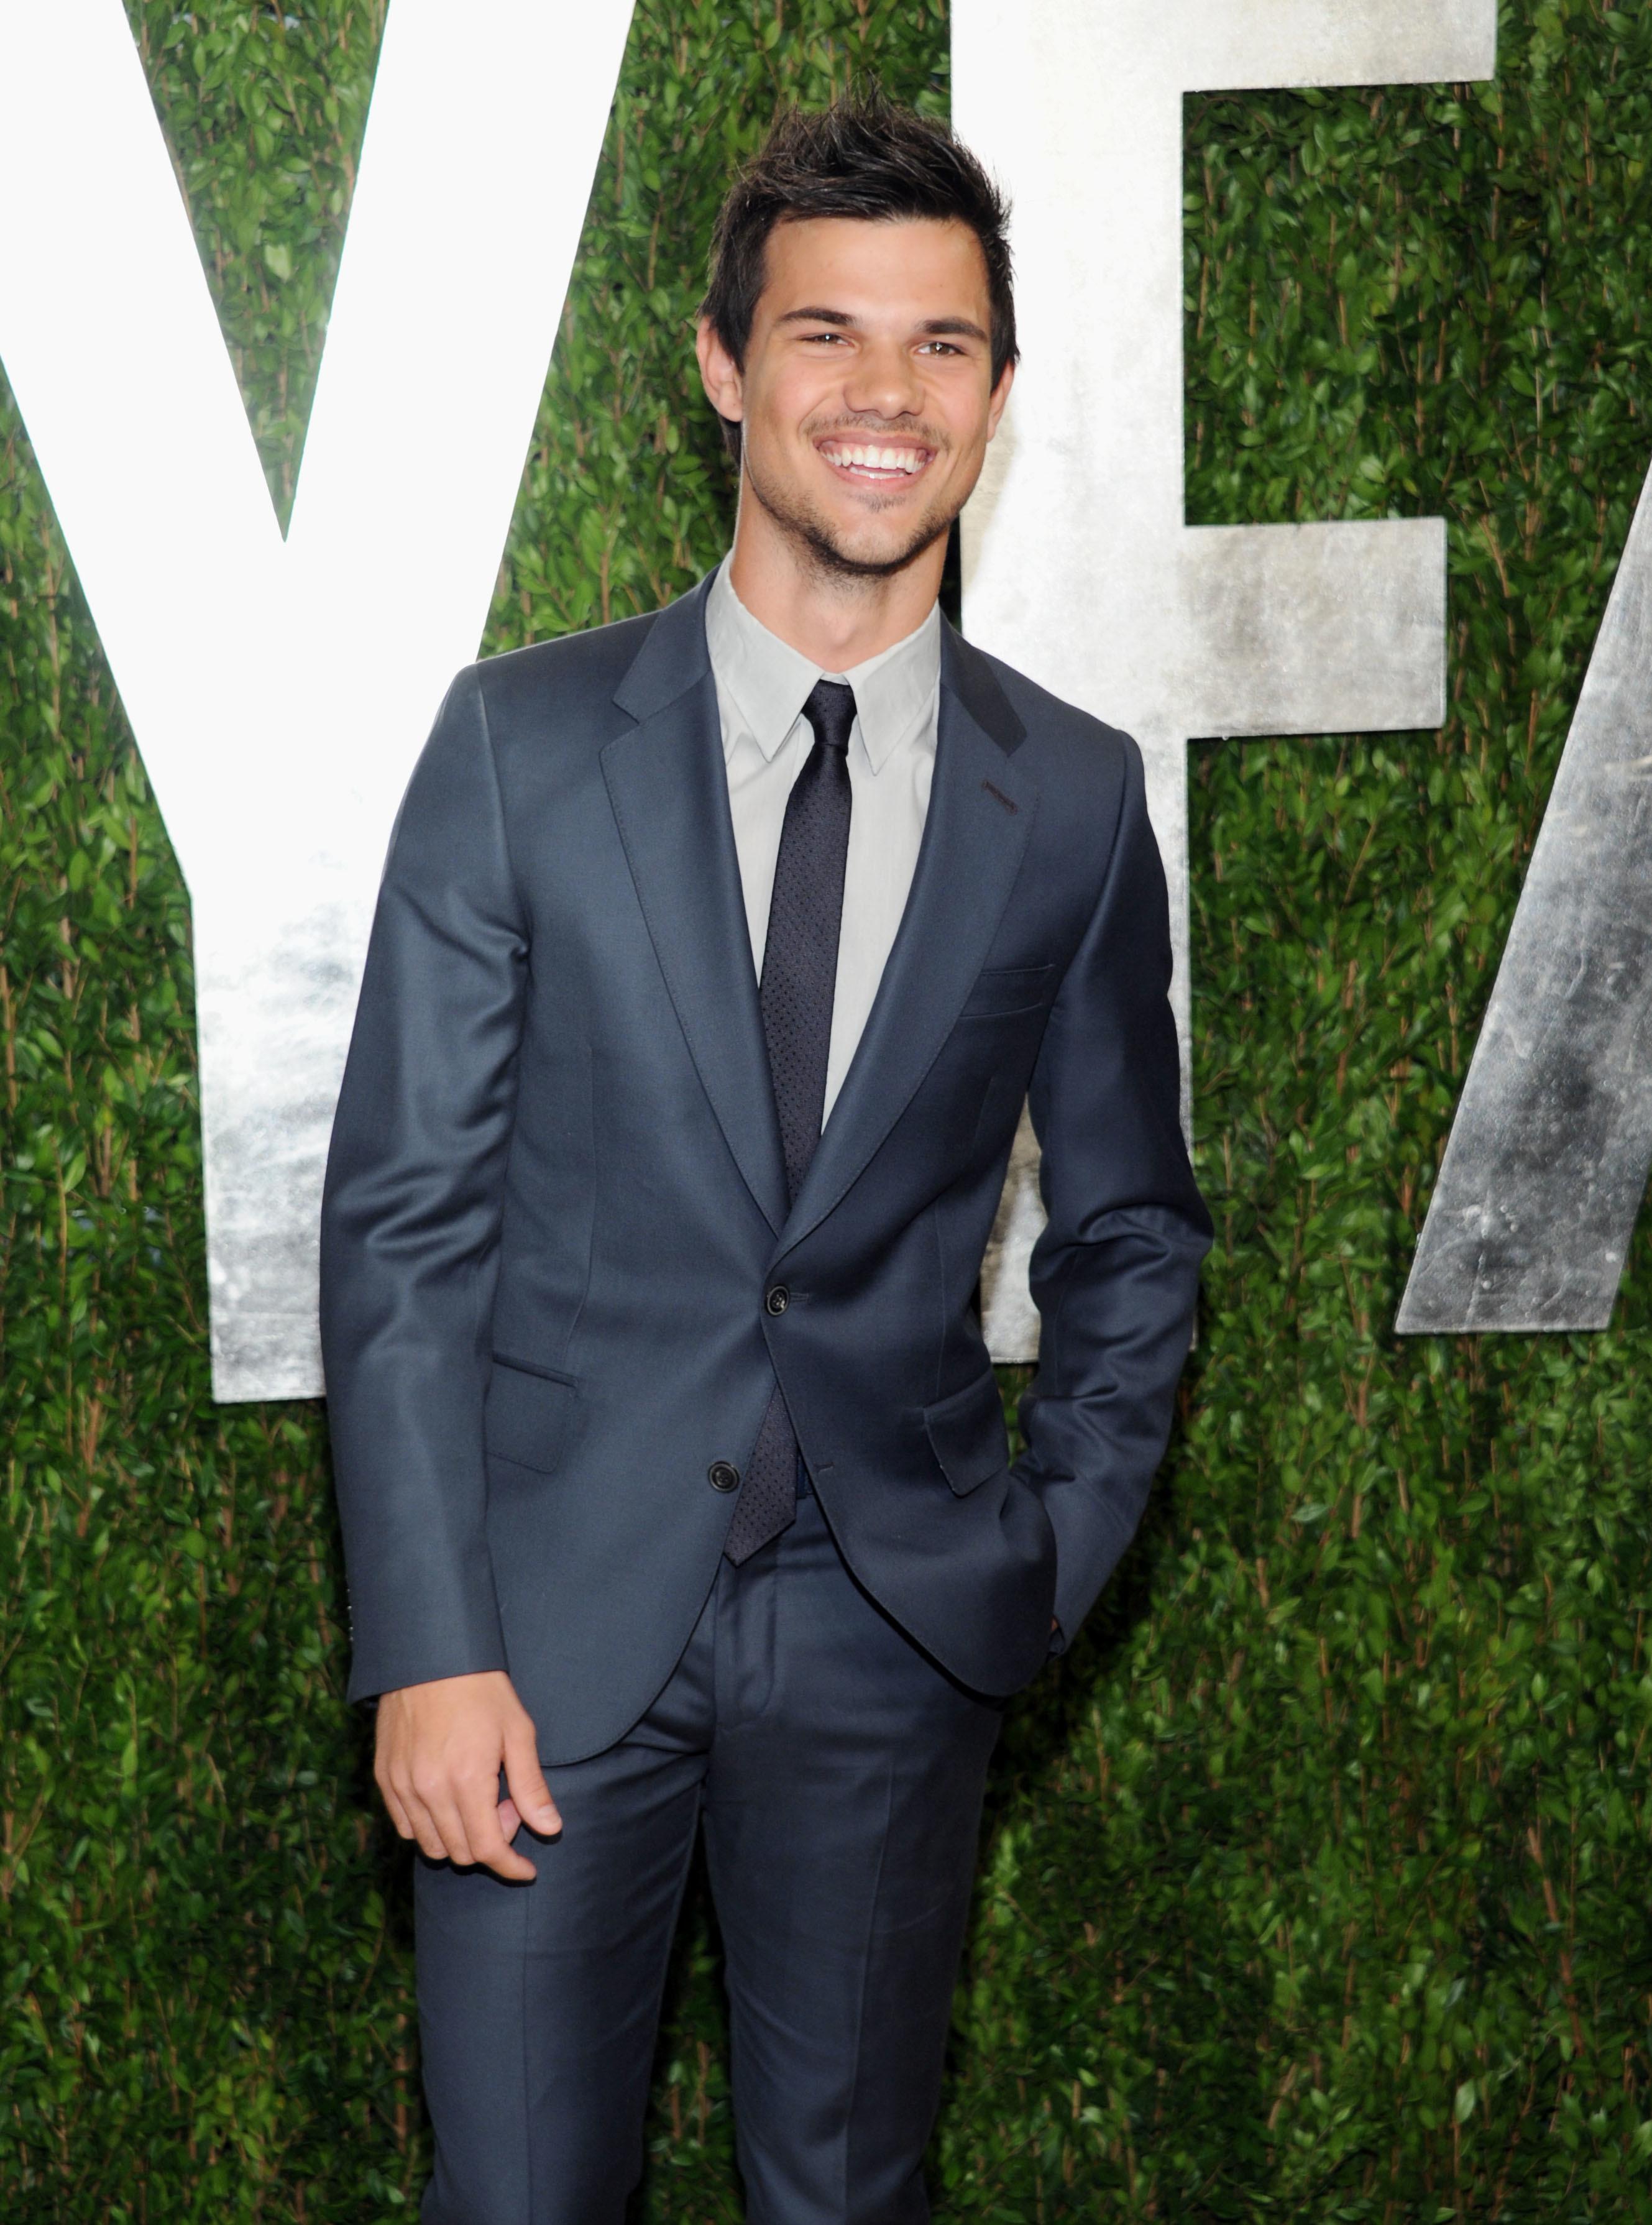 Taylor Lautner 21st birthday